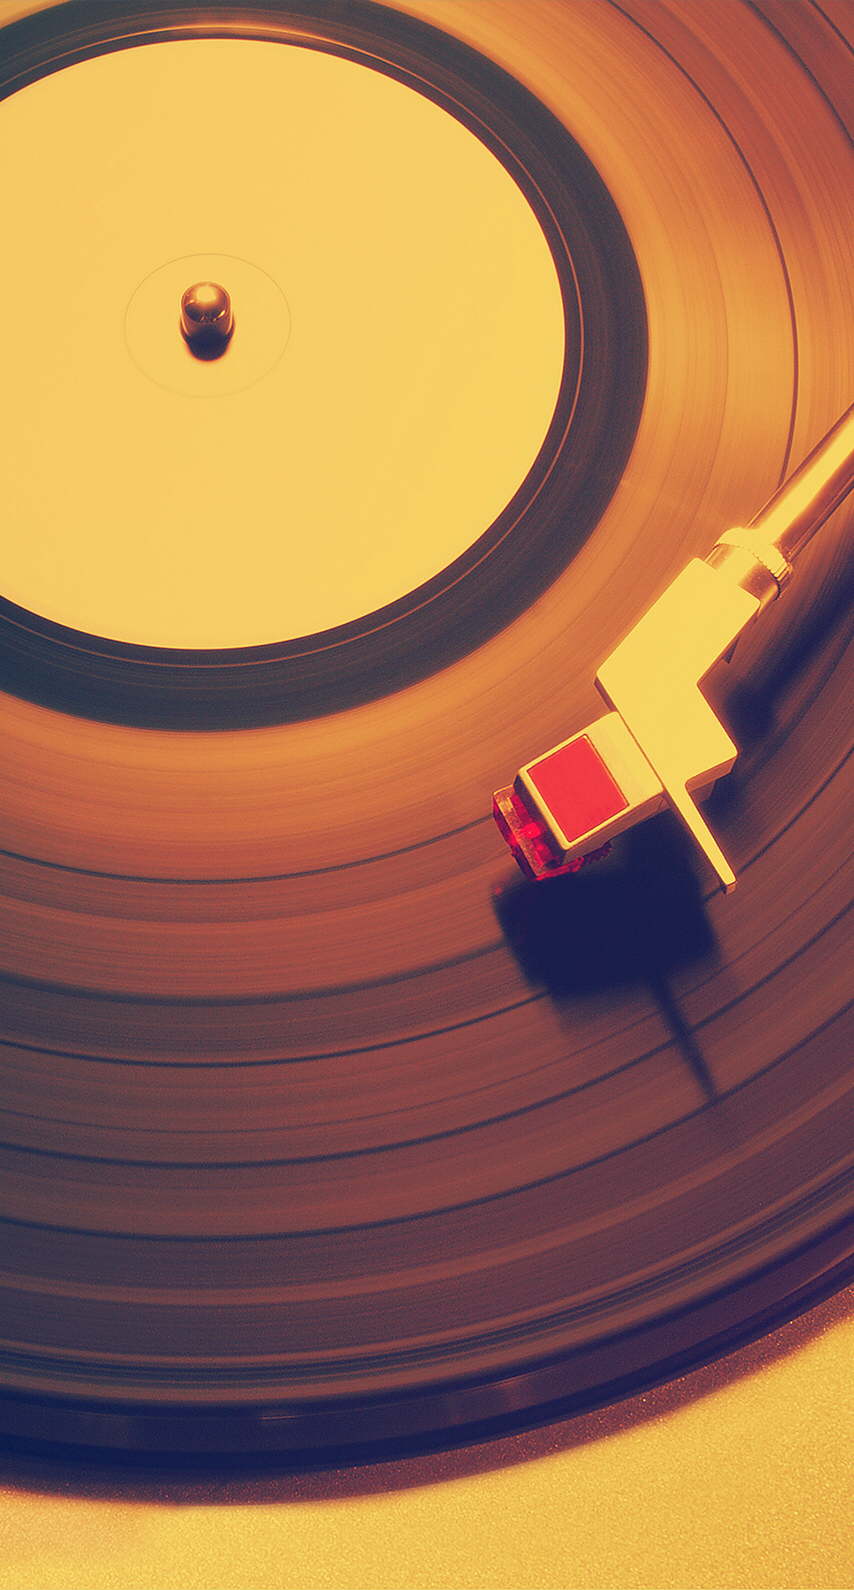 iWallpapers Wallpapers in 2019 Vinyl music, Music